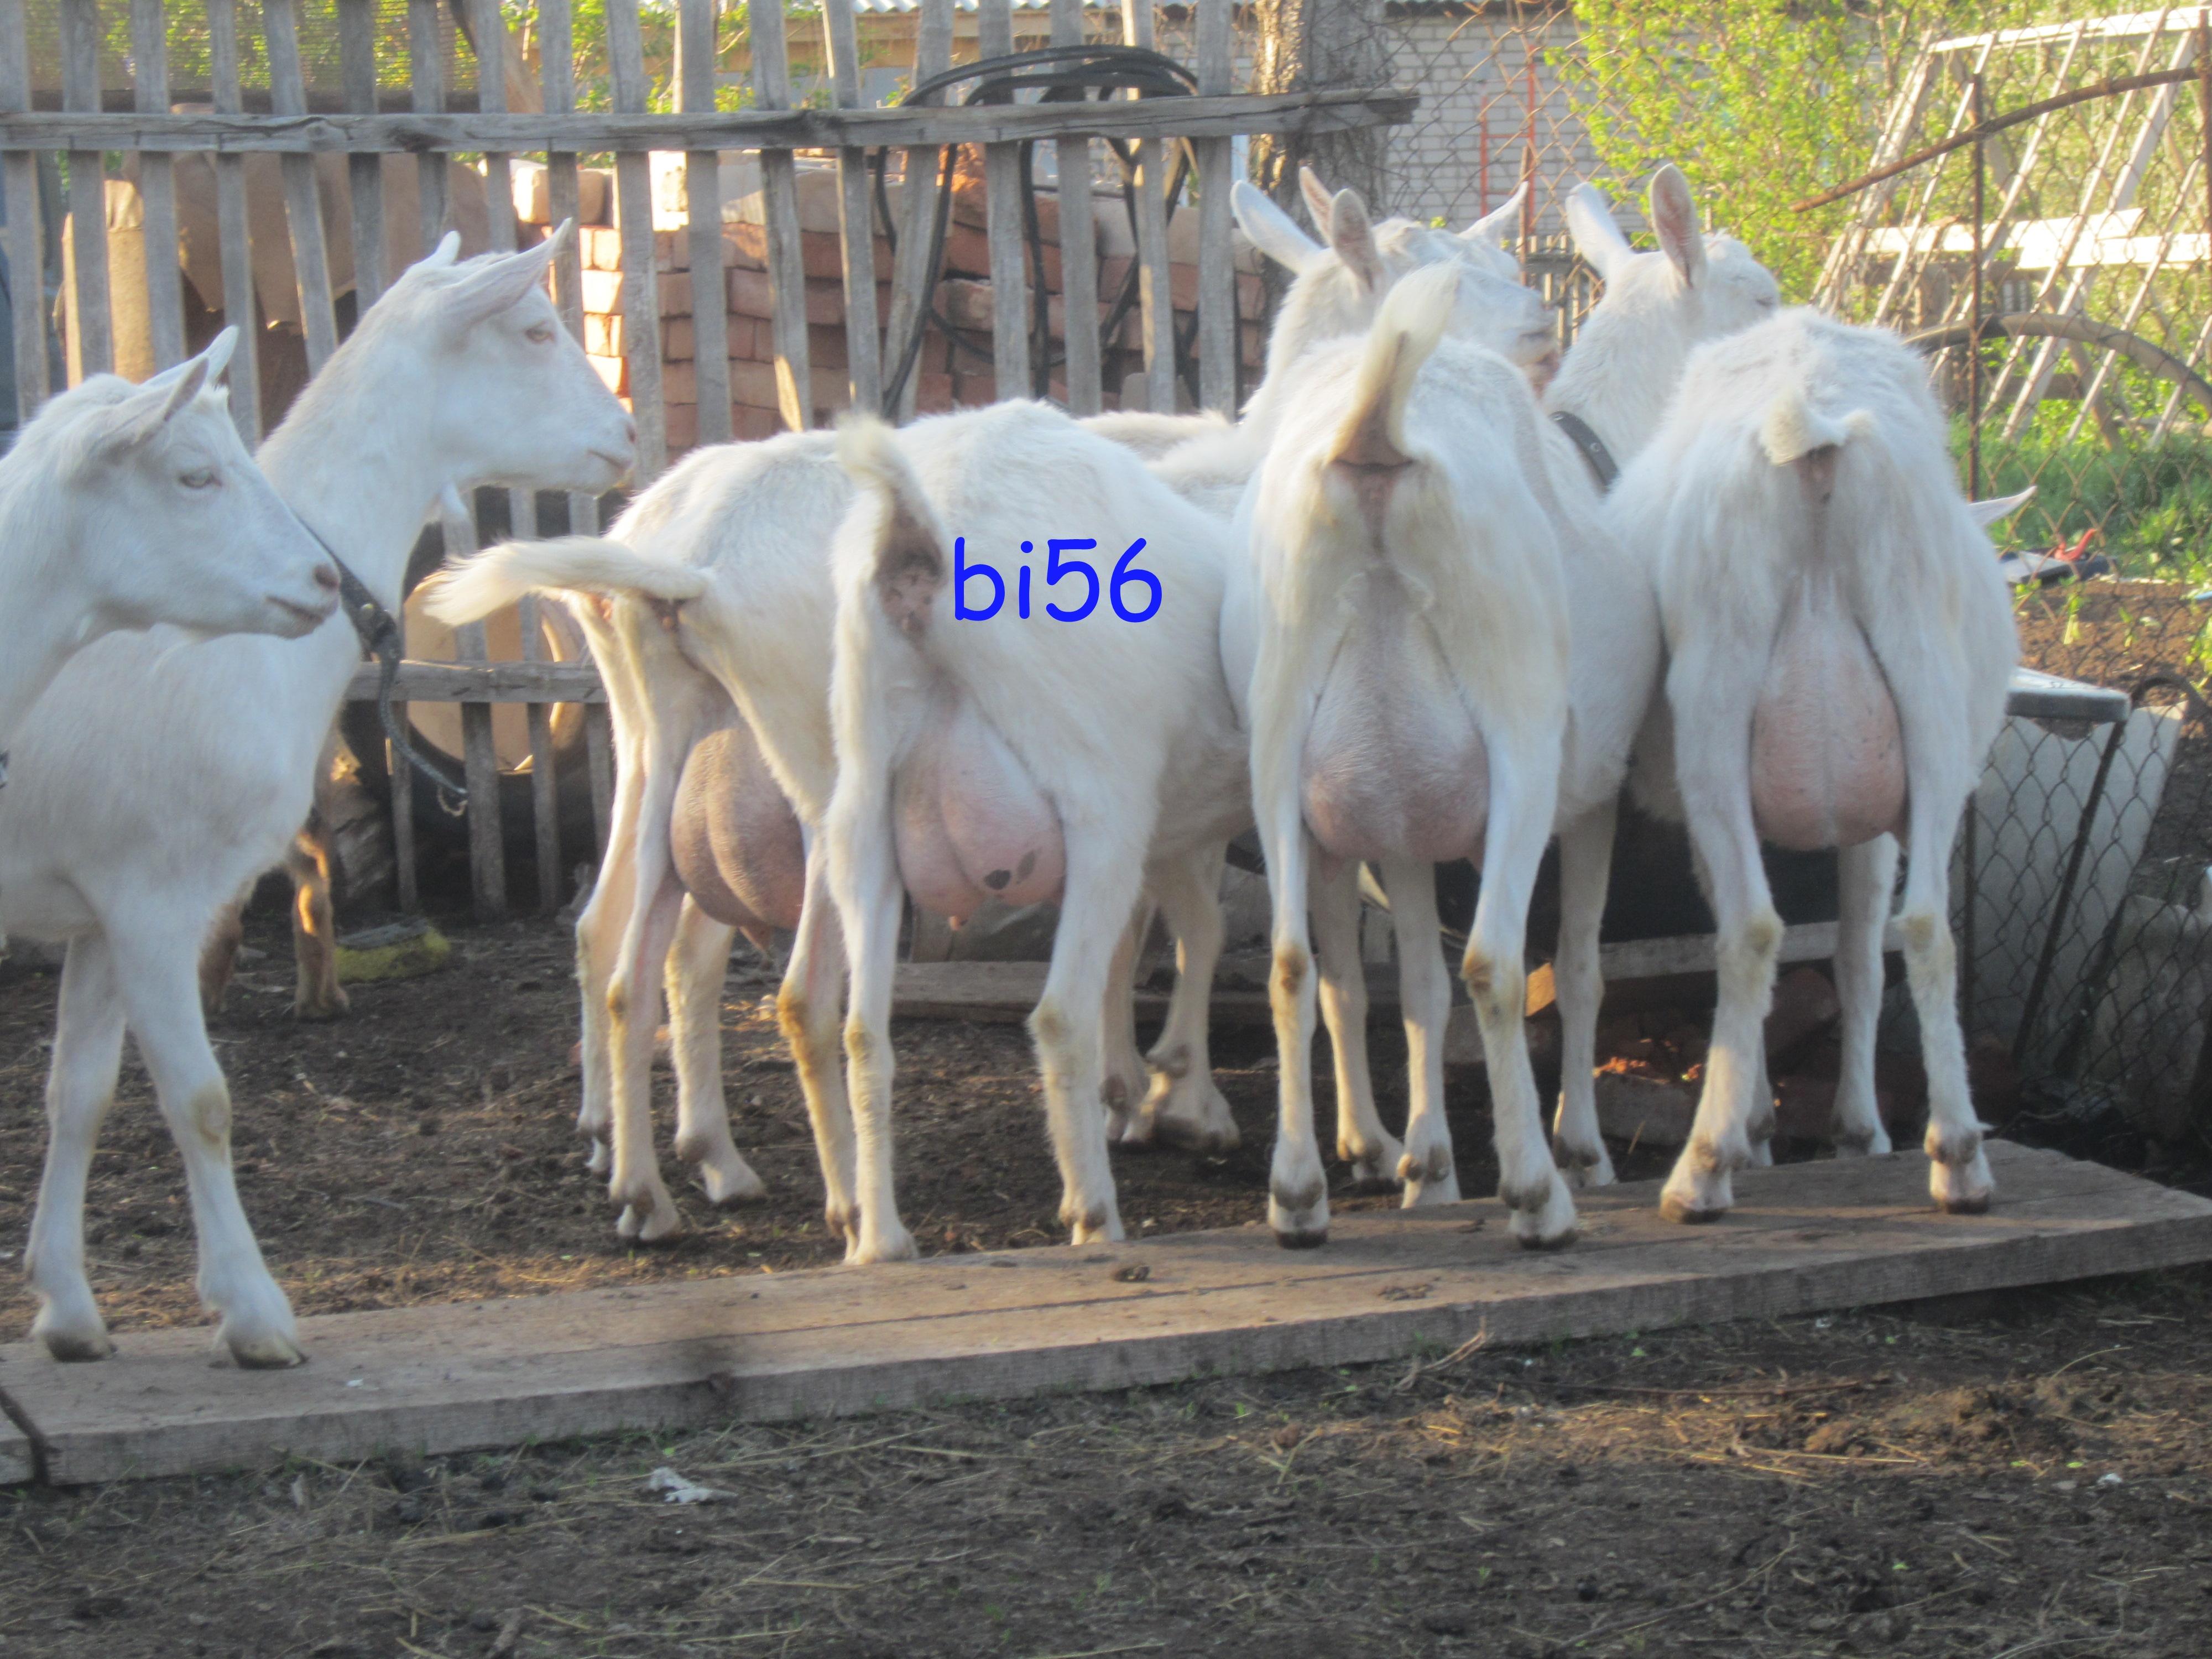 img5483.jpg